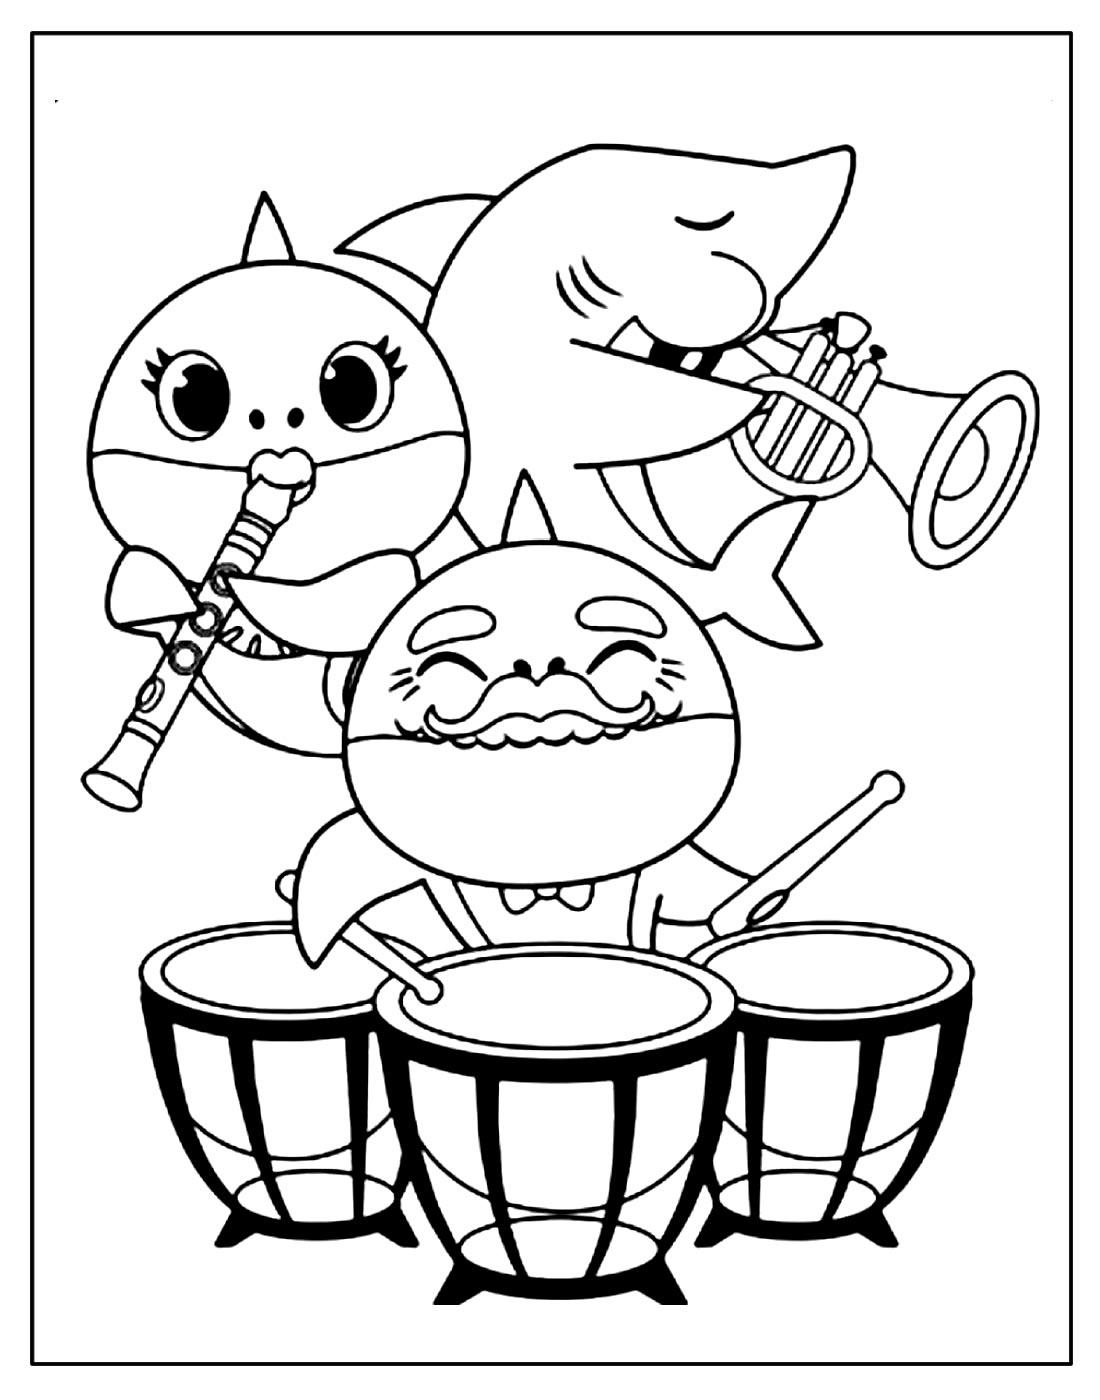 Desenho para colorir de Baby Shark